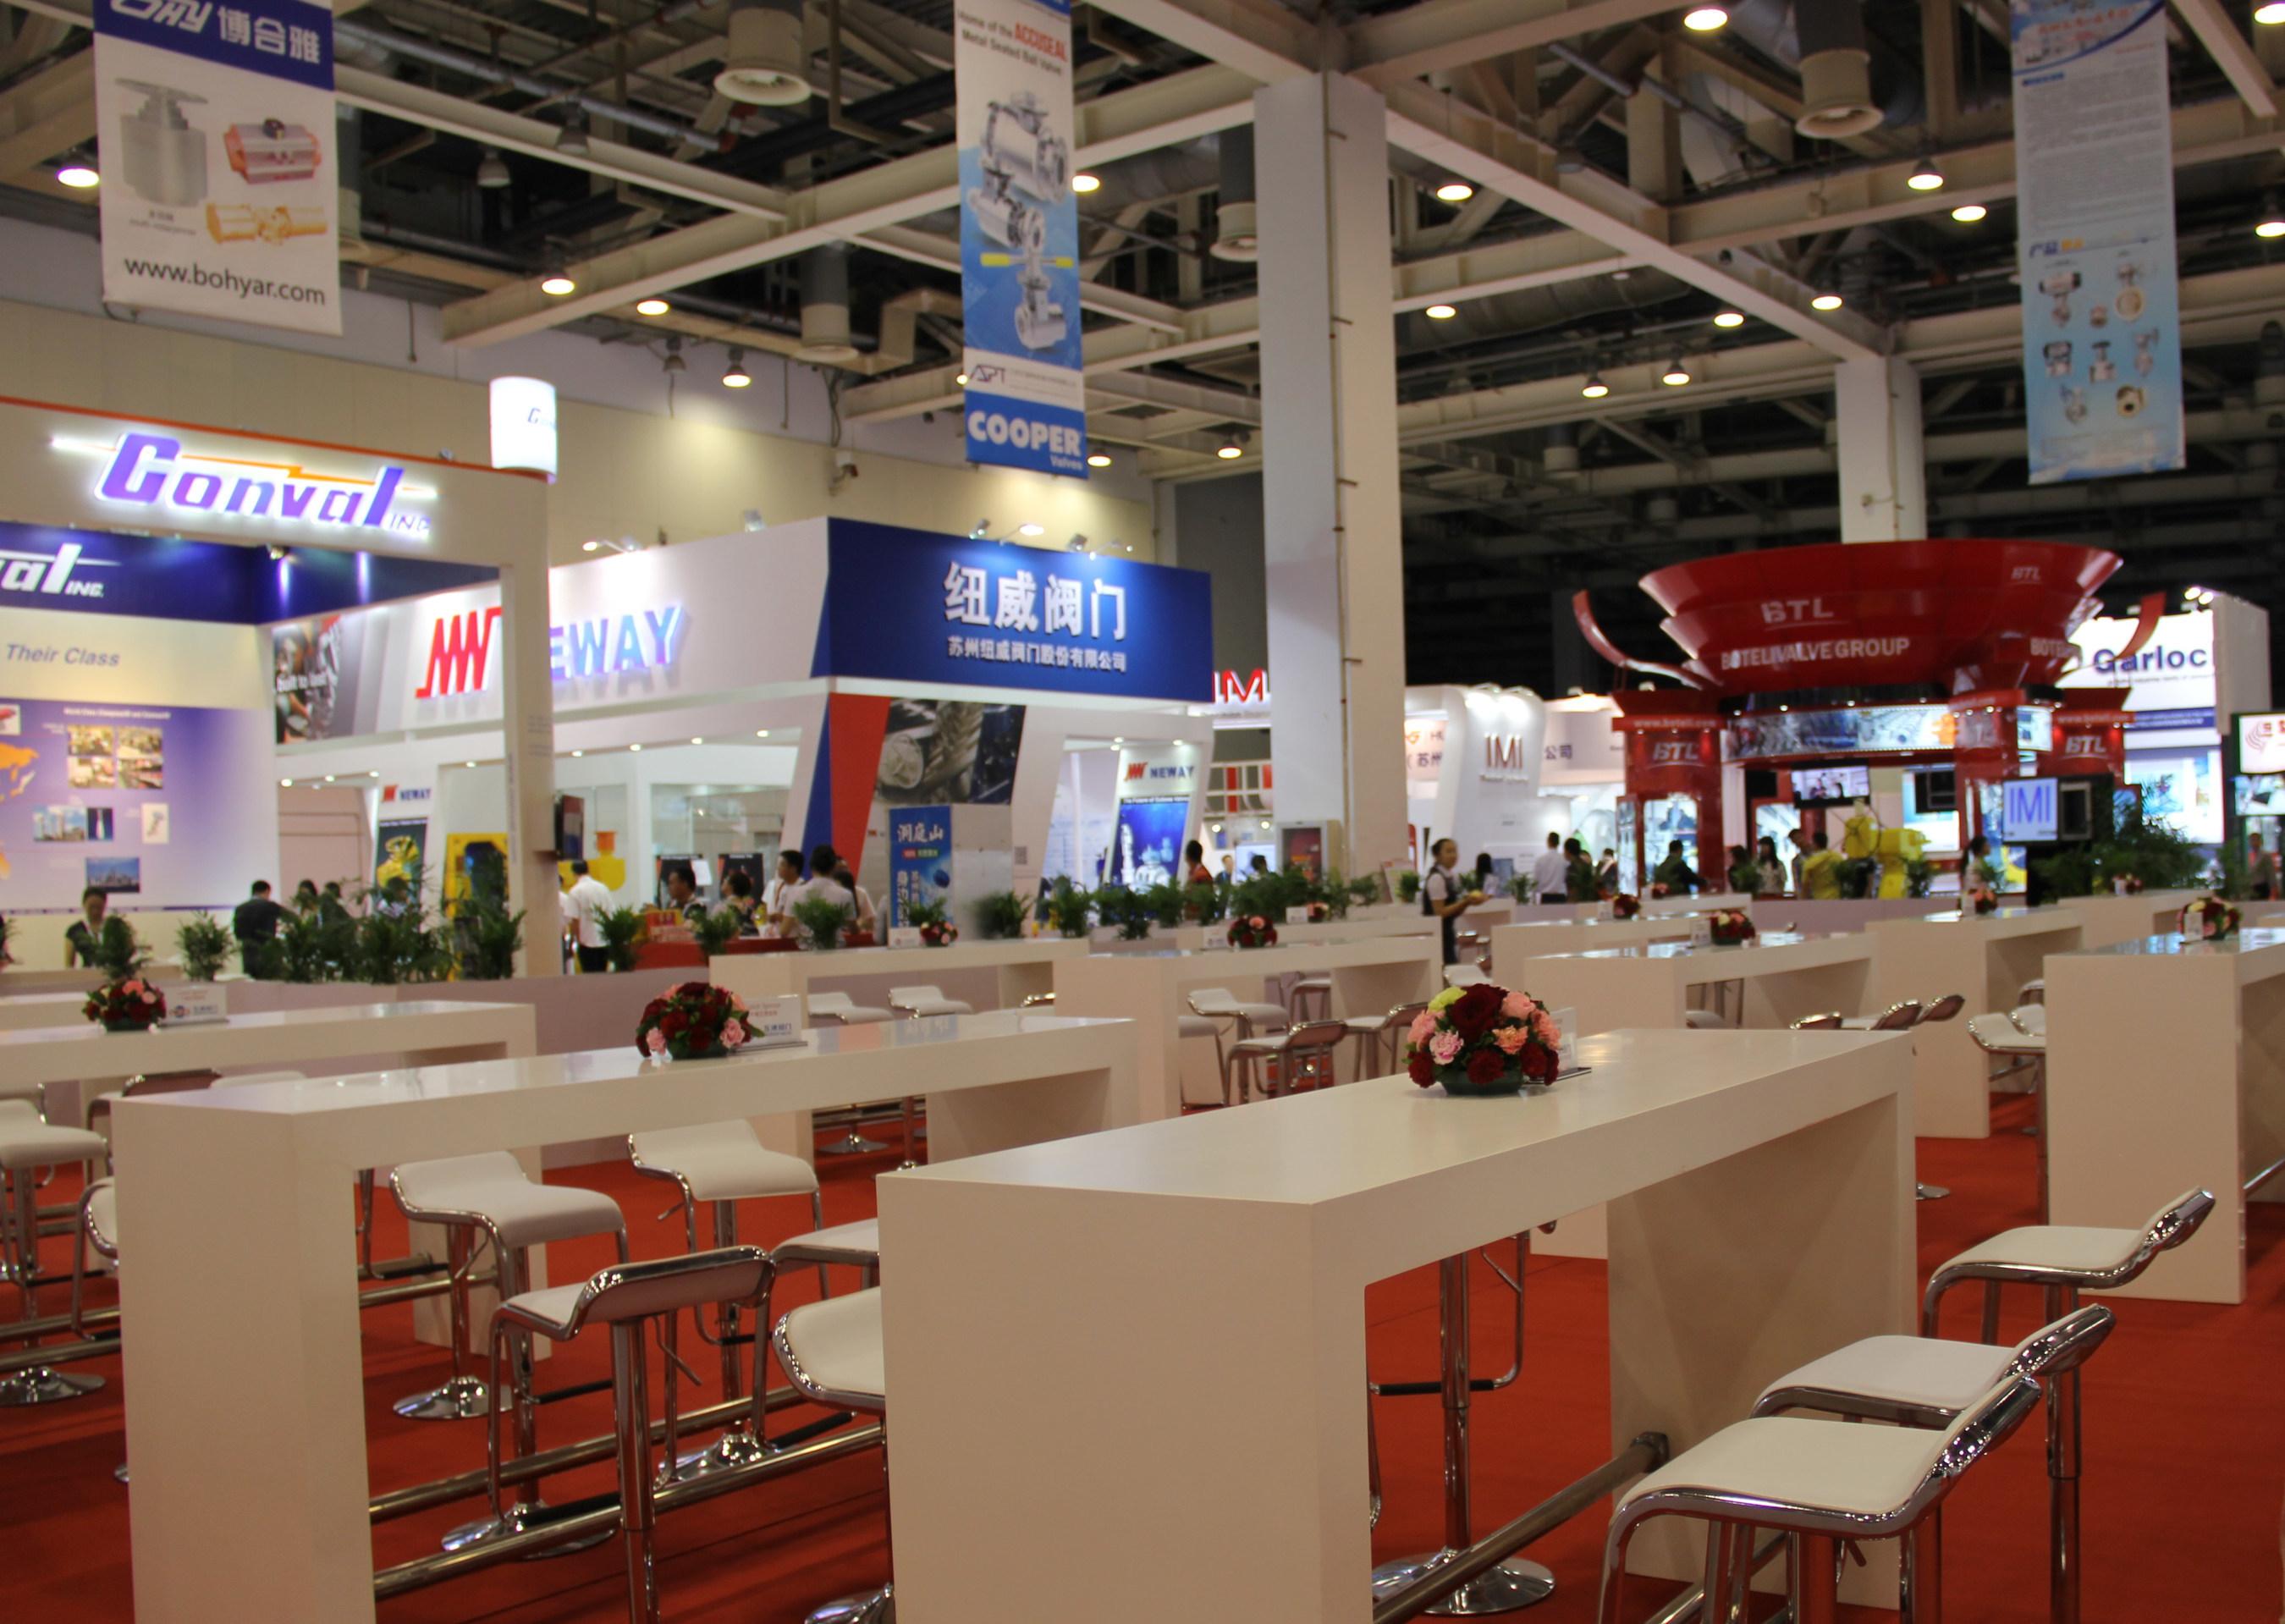 Valve World Expo & Conference Asia 2015 im Suzhou International Expo Center erfolgreich